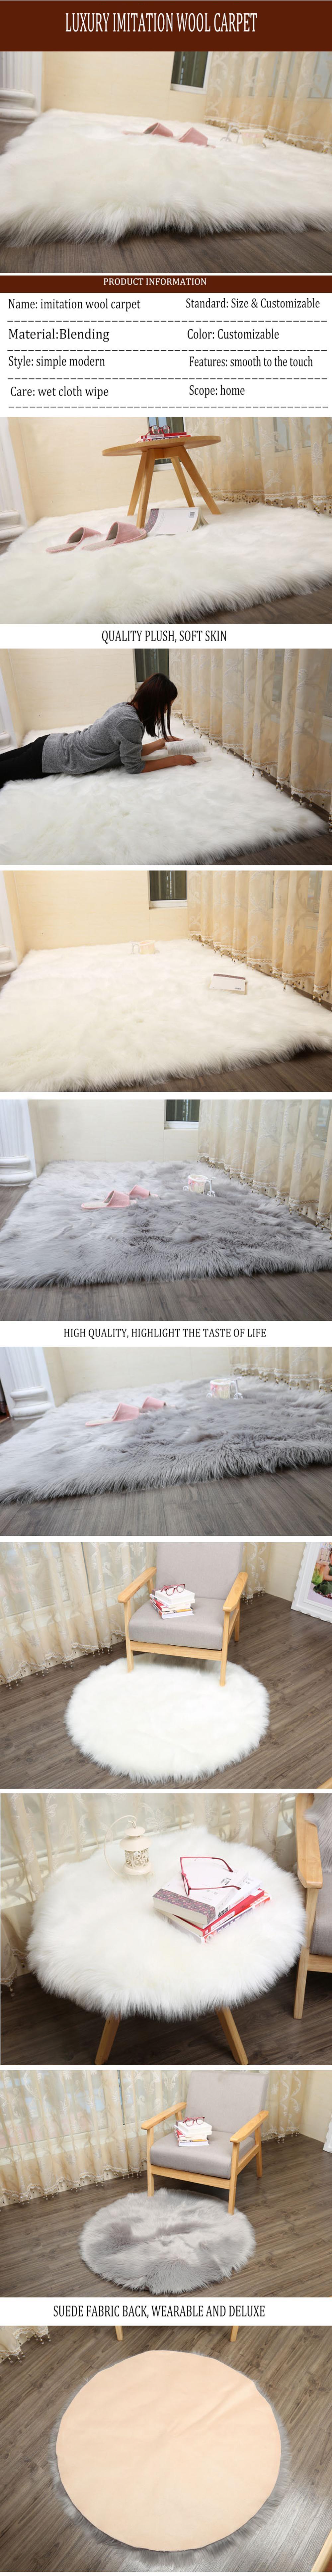 Jacquard Printed Artificial Fur Cowhide Rug Cow Hair On Hide Cow Print Rug And Carpet Faux Fur Animal Skin Rugs Buy Rug And Carpet Faux Jacquard